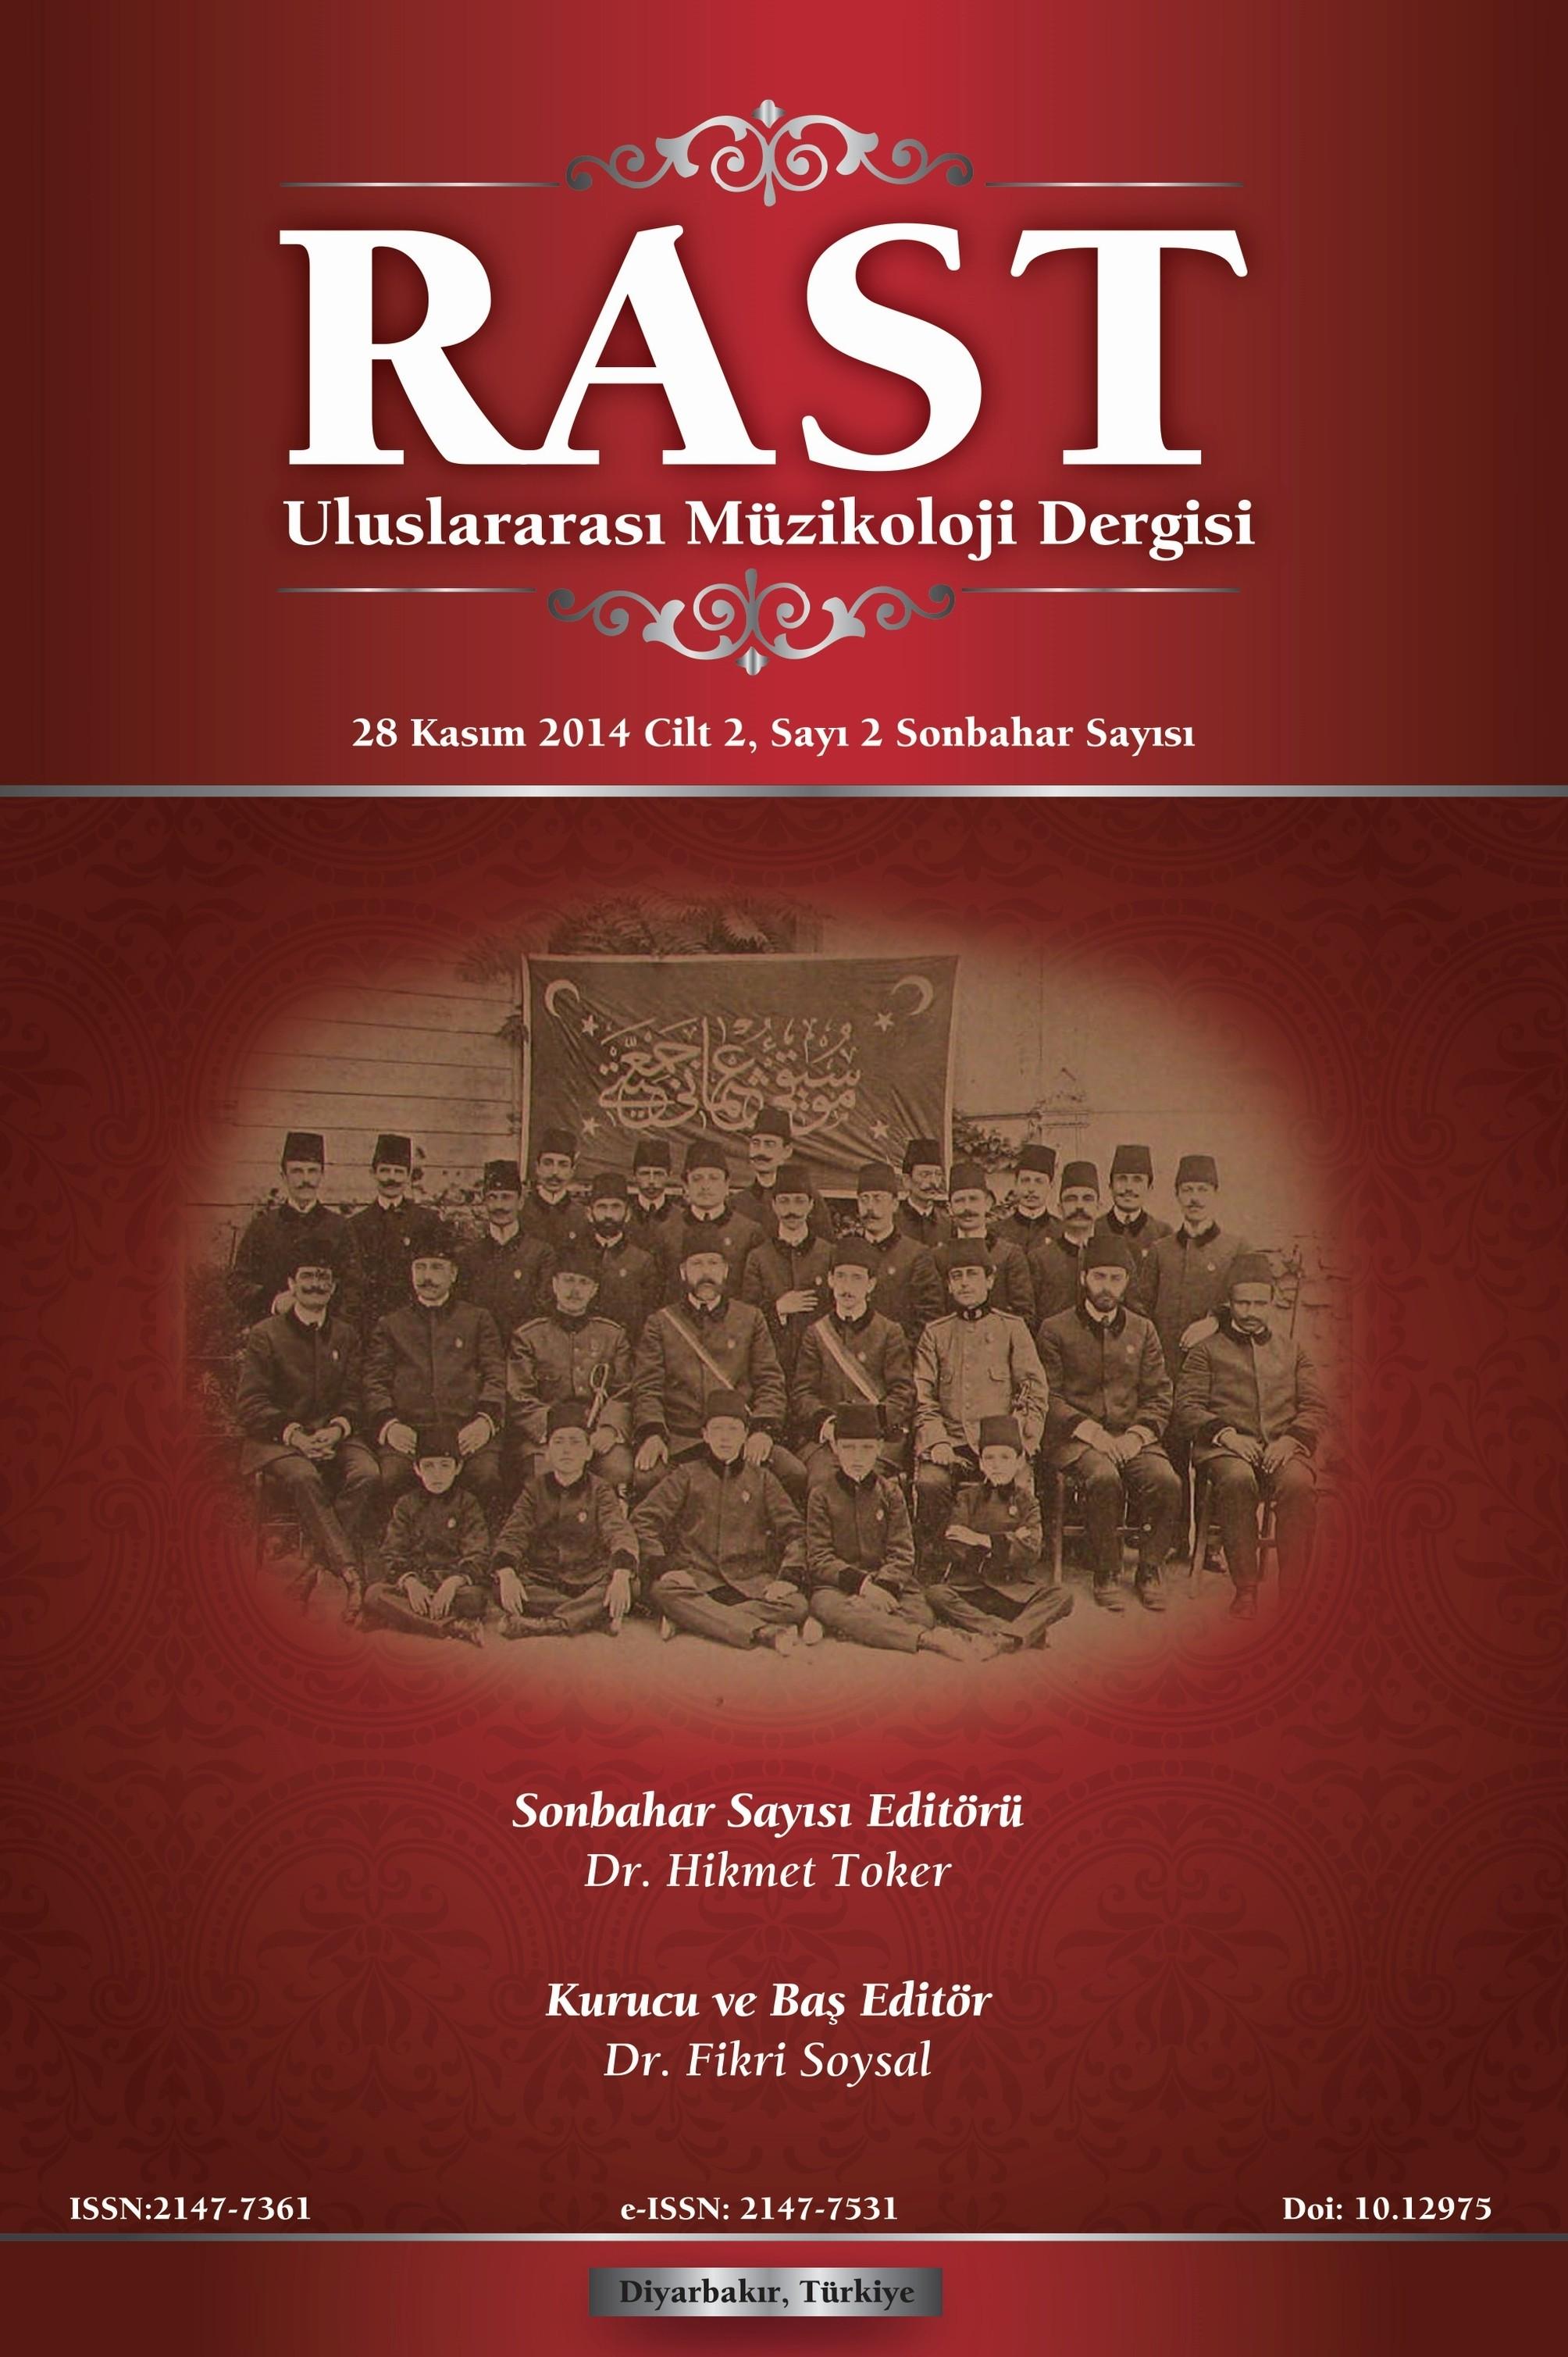 Rast Musicology Journal